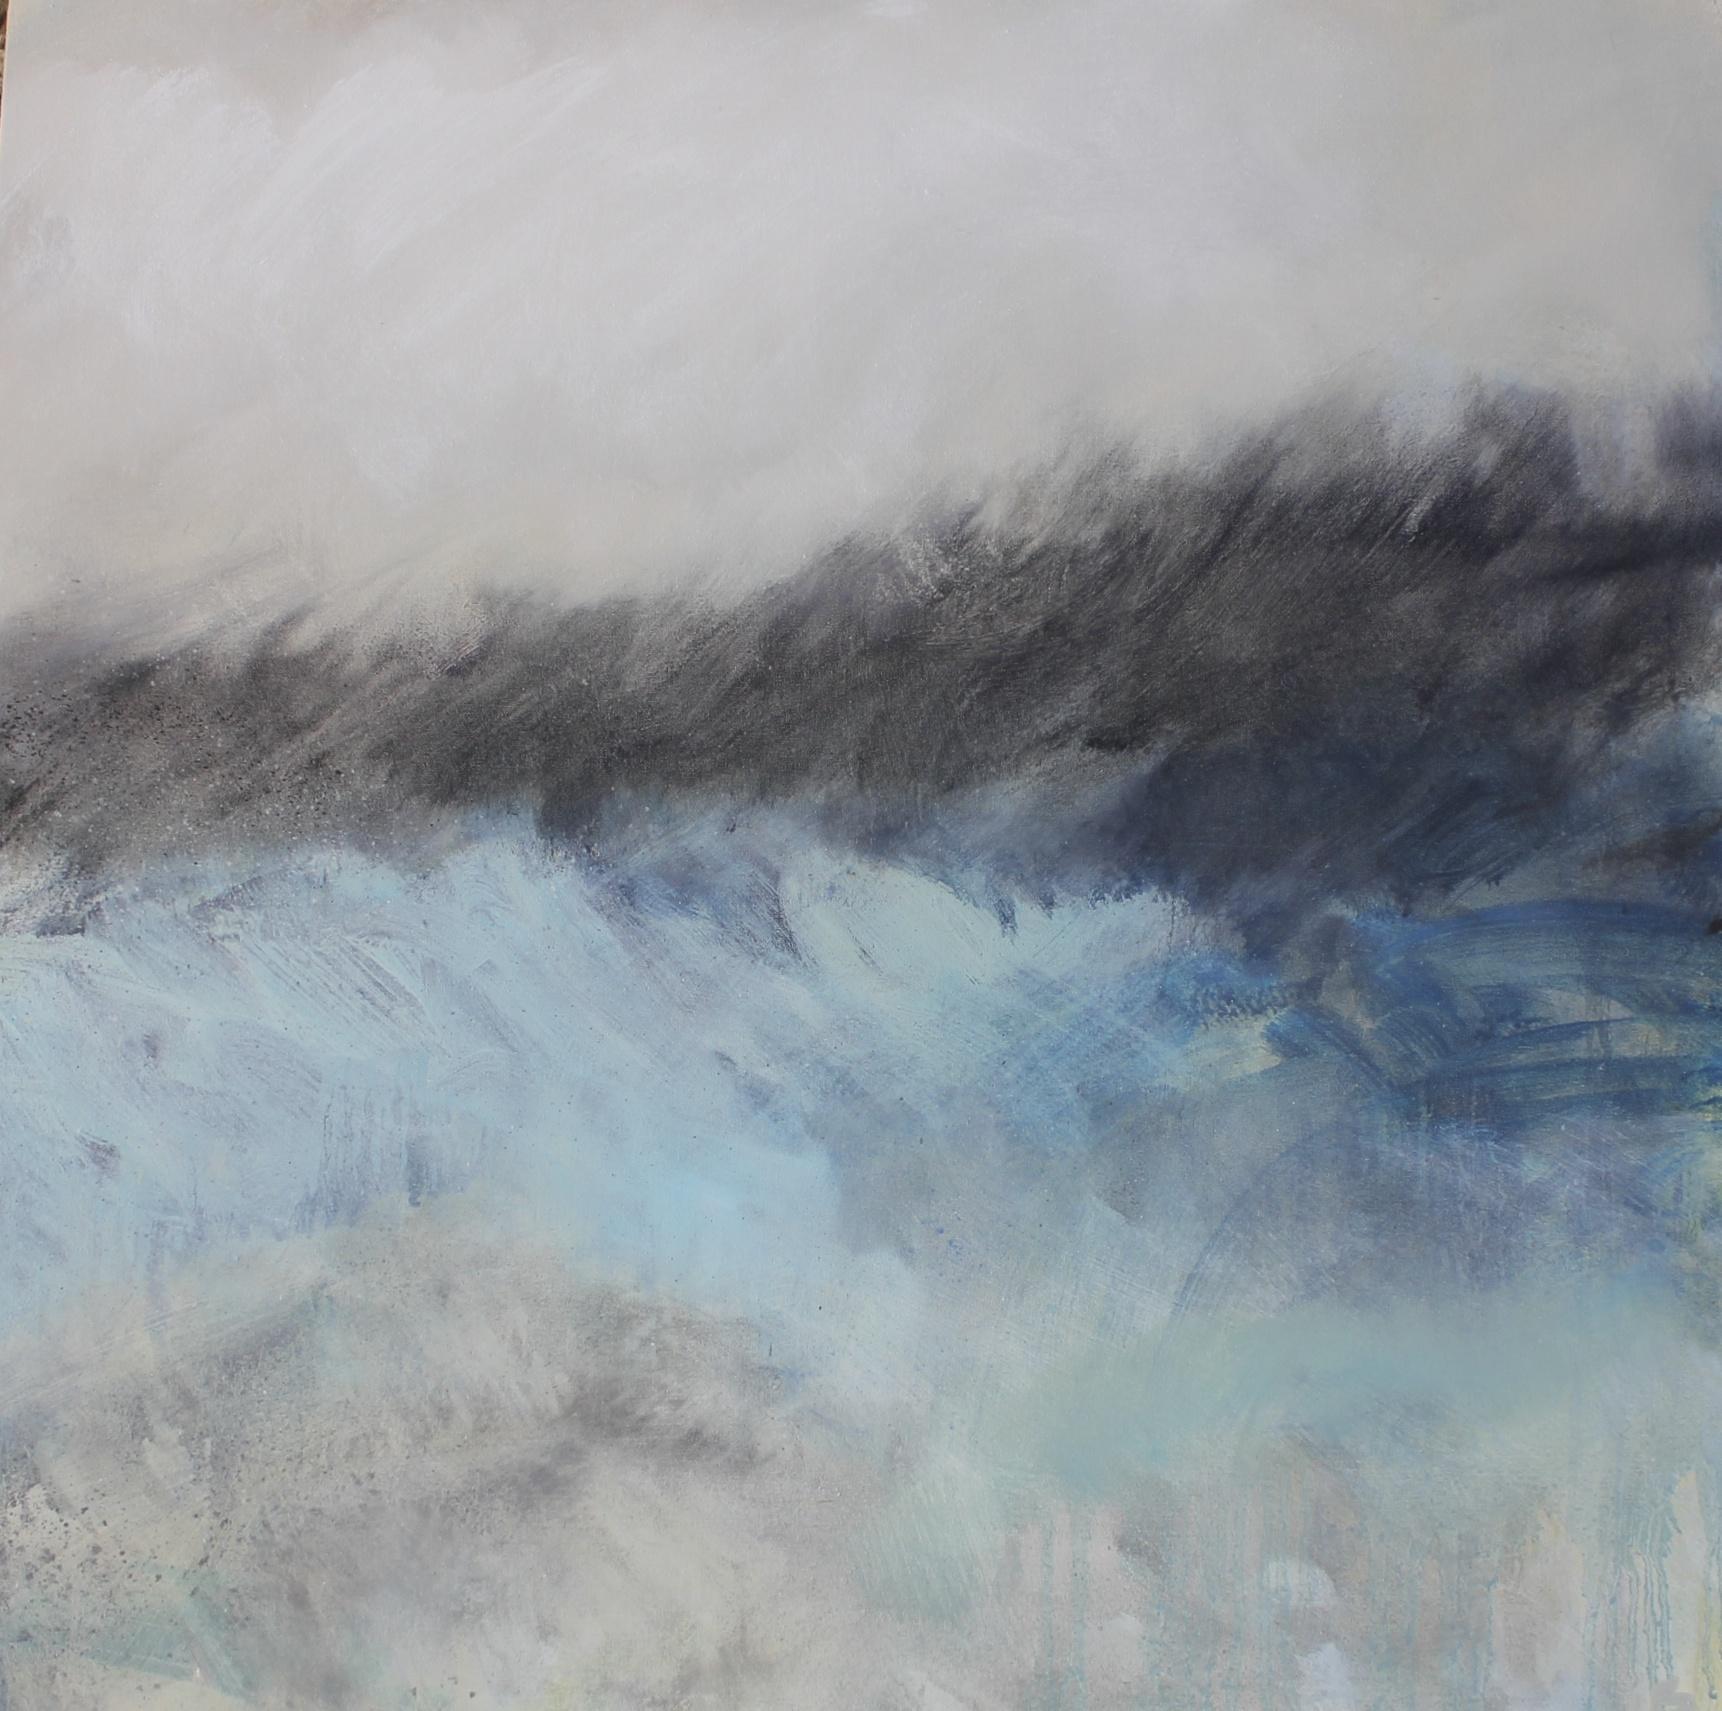 Leah-Beggs-2014-Oil-on-Canvas-72-x-72-cm-WESTERLY-WINDS.jpg